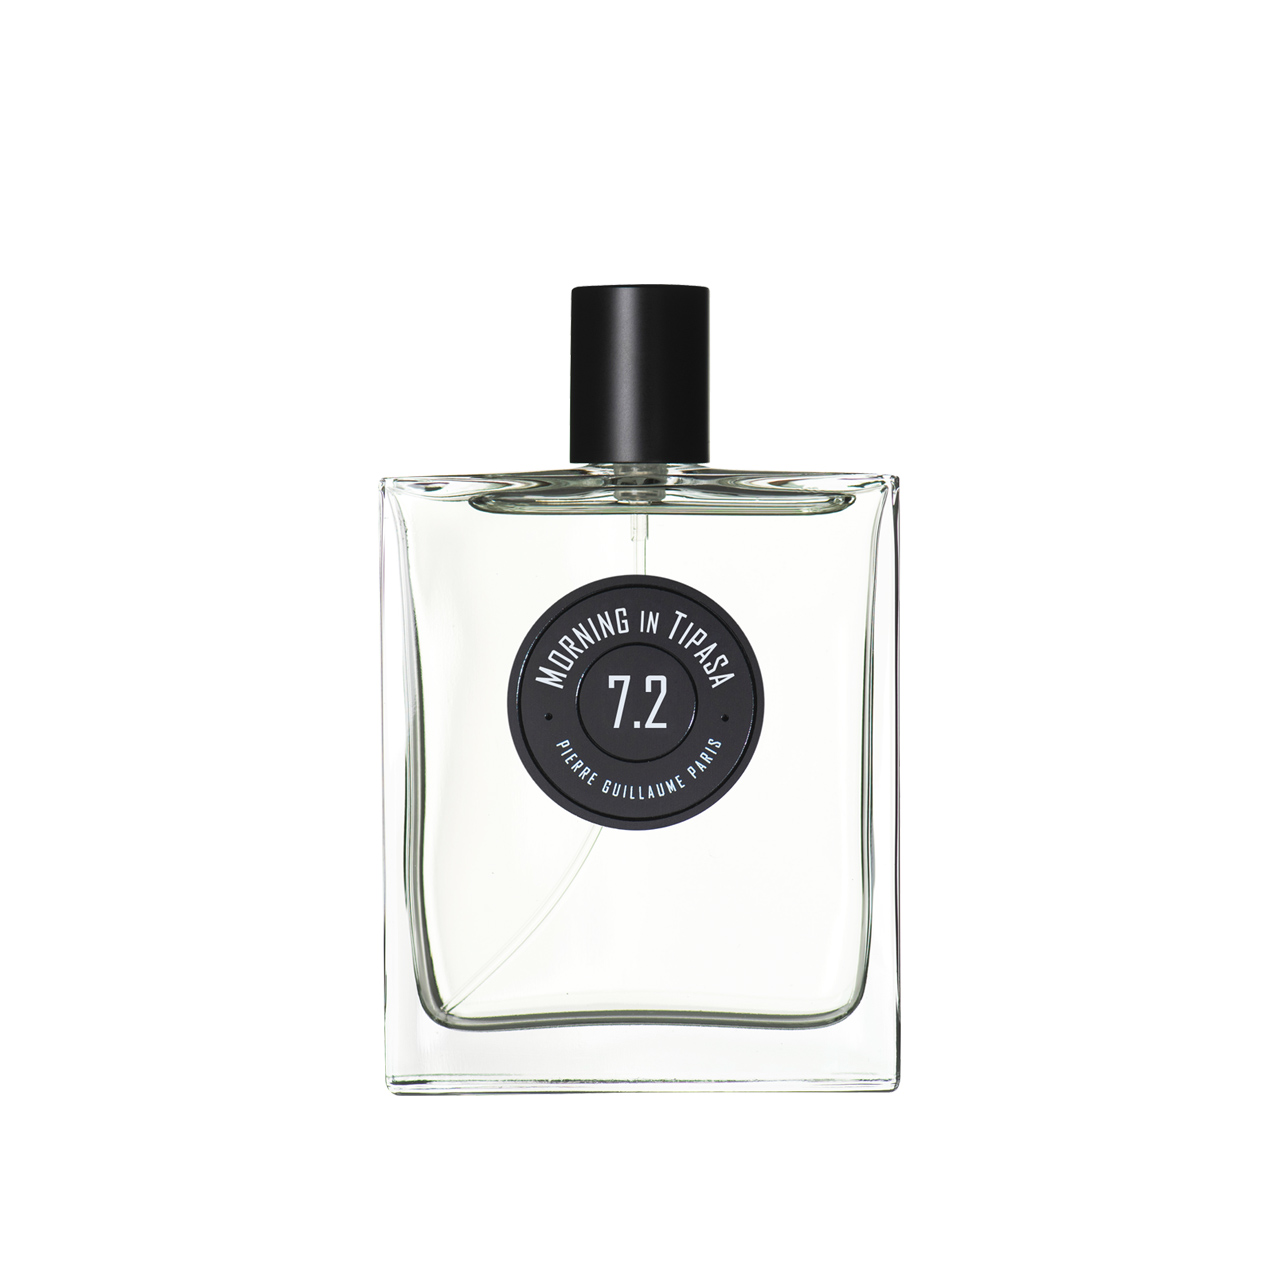 7.2 Morning In Tipasa - Eau de Parfum